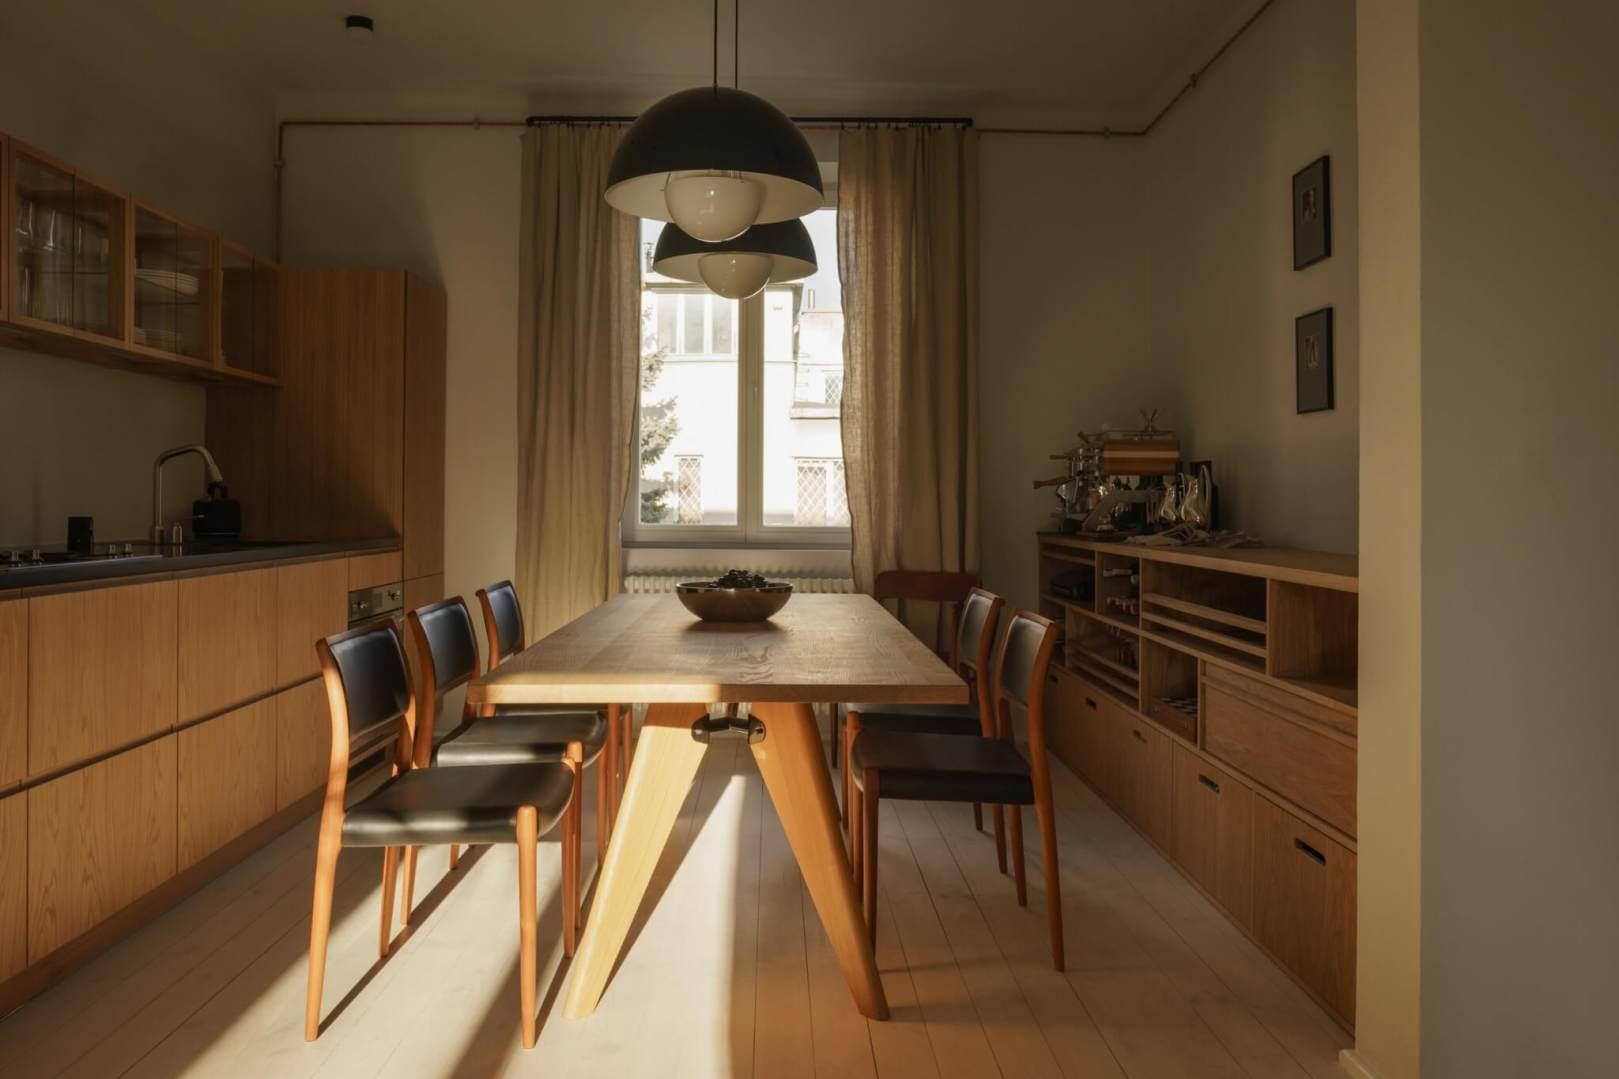 Historyczne podejście do projektu mieszkania w domu z 1939 roku | Proj: Loft Kolasiński